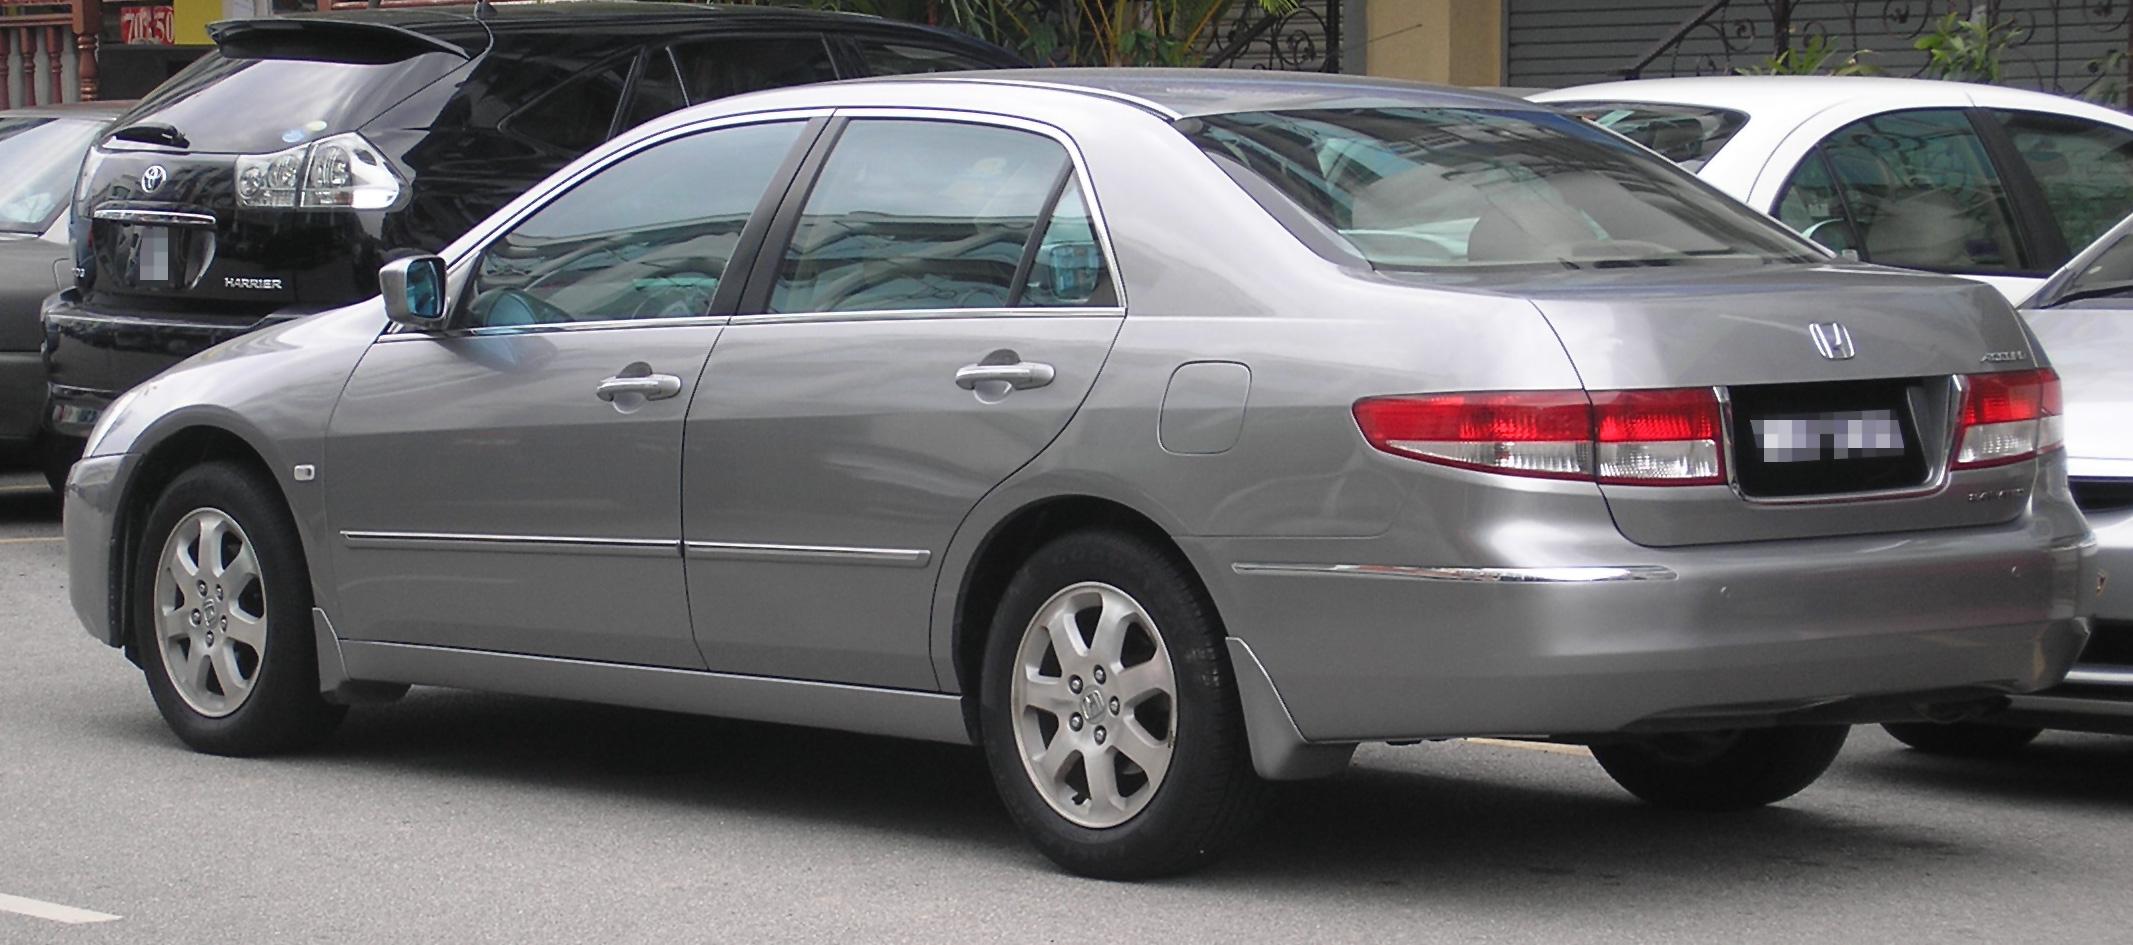 2007 Honda Accord >> File:Honda Accord (seventh generation) (rear), Serdang.jpg - Wikimedia Commons